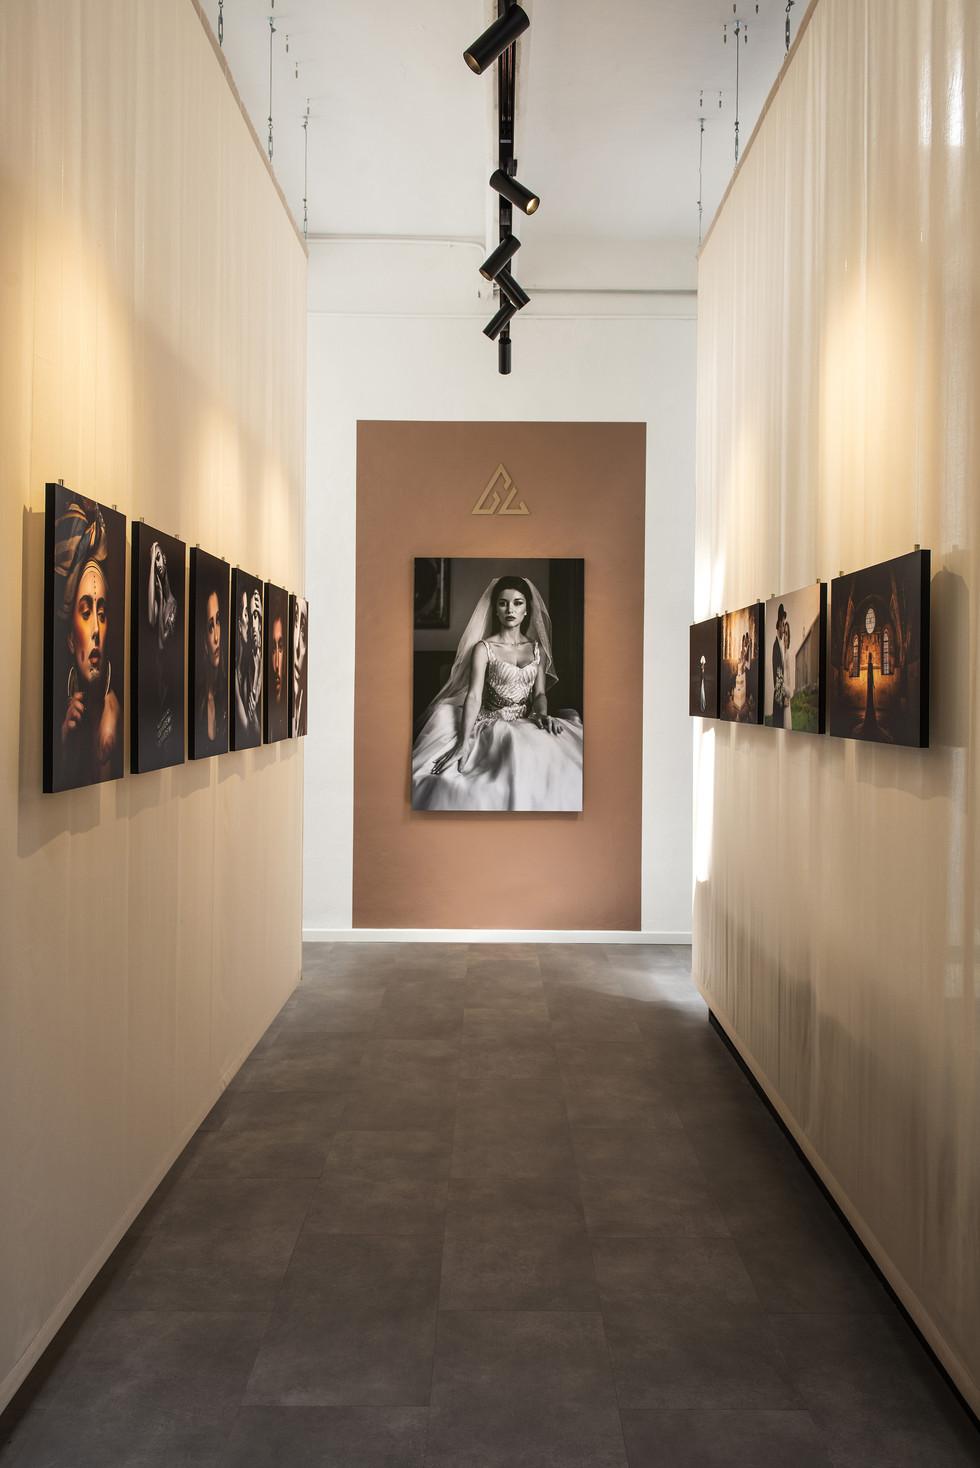 galleria fotografica I photography gallery